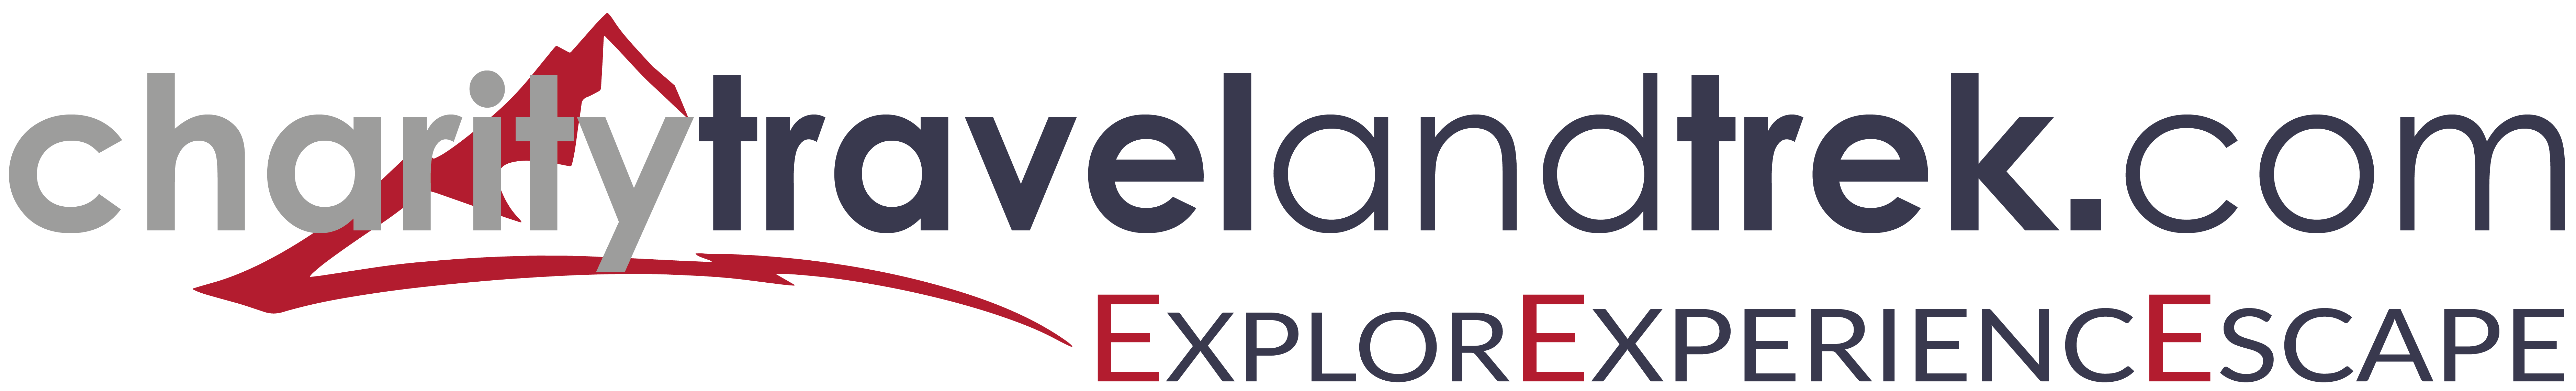 Charity Travel and Trek logo